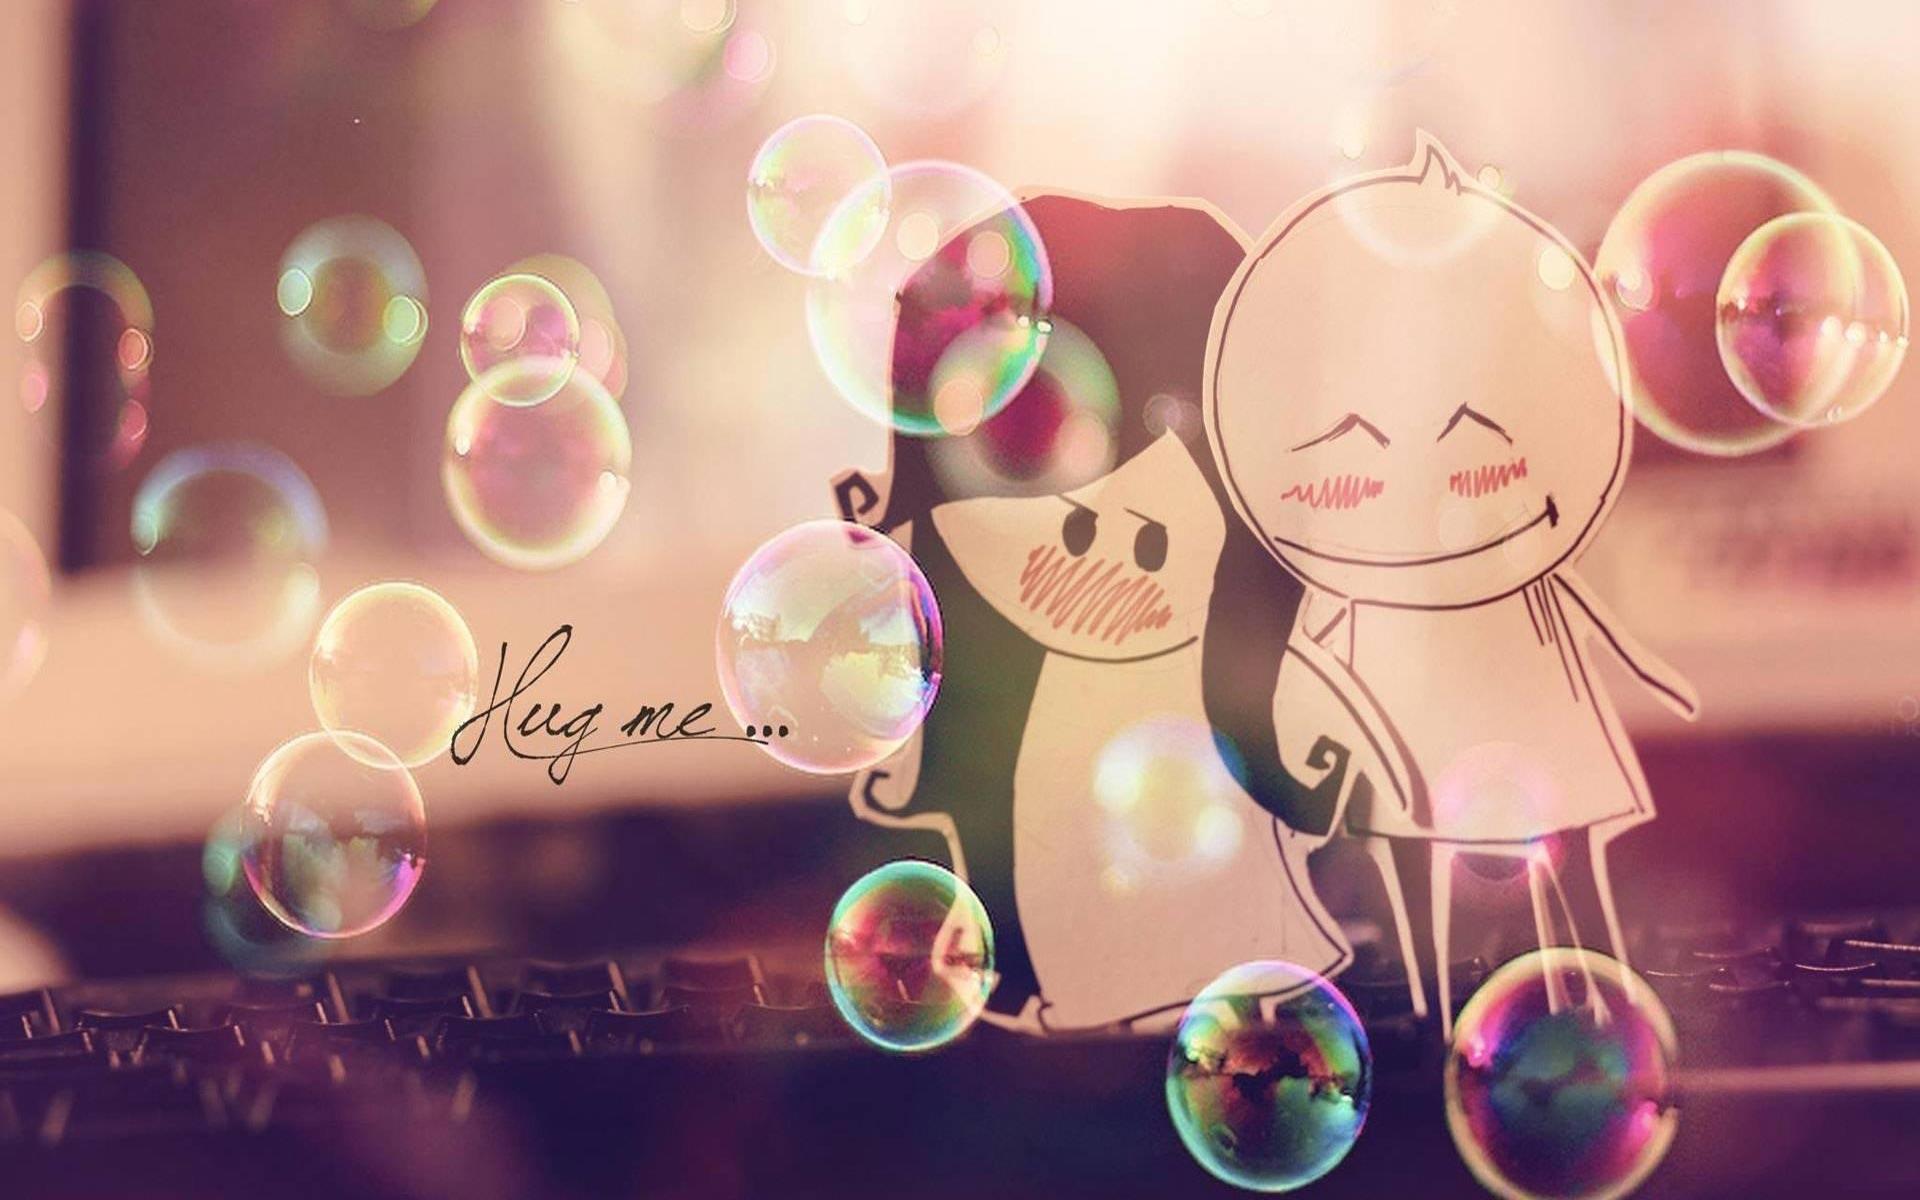 love, hug, cute, adorable, paper